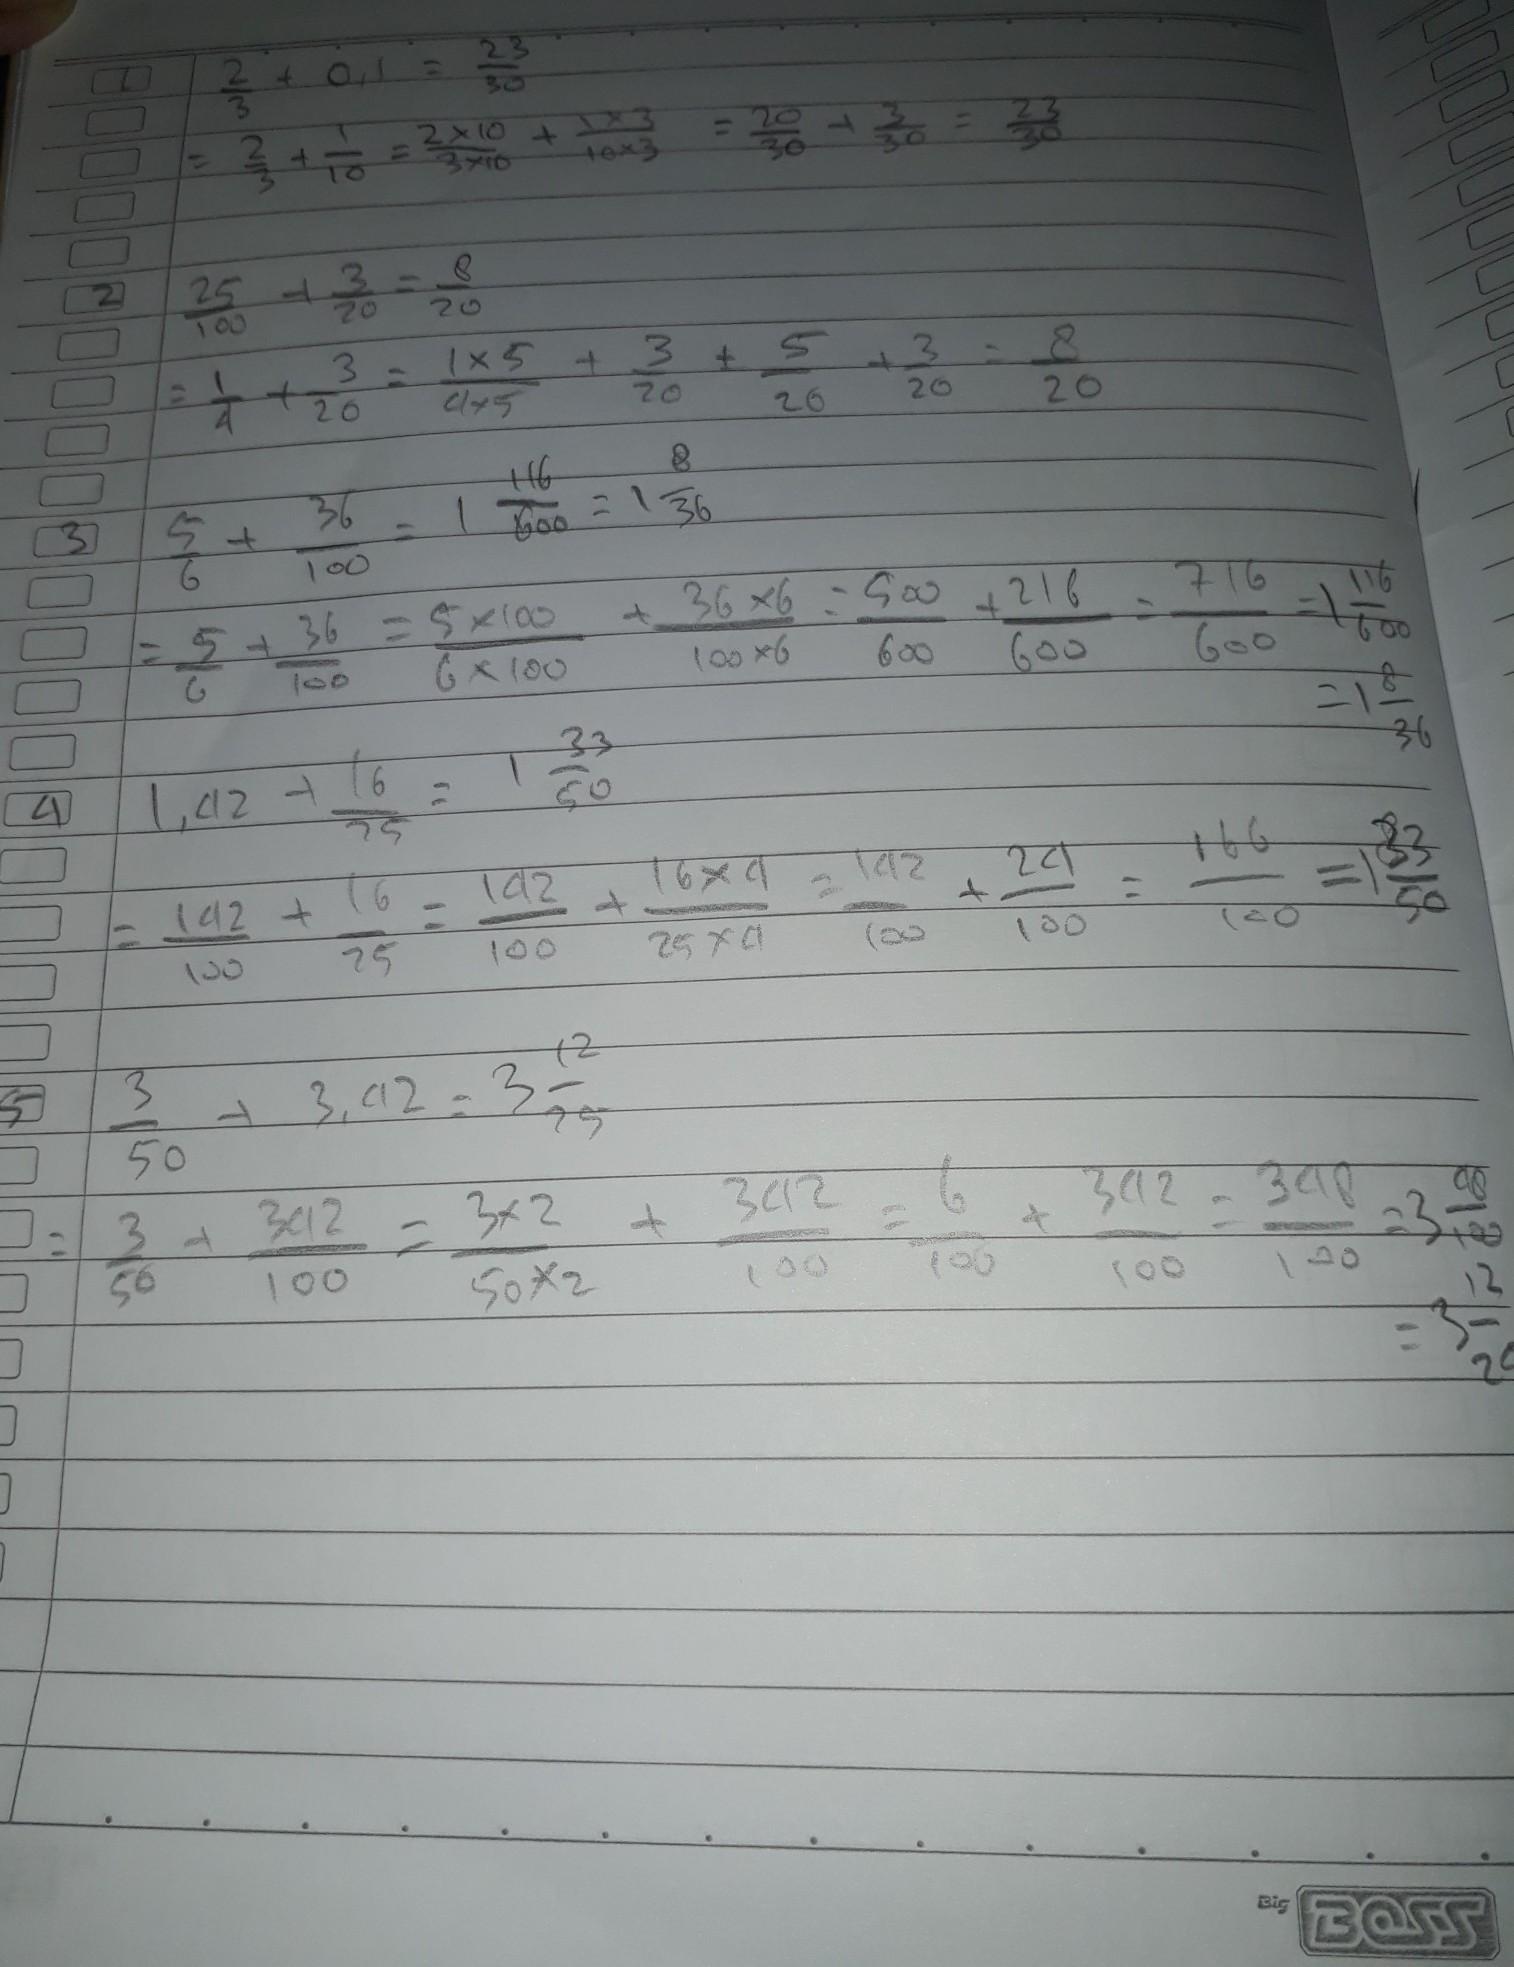 kunci jawaban belajar matematika kelas 6 halaman 45. Kunci Jawaban Matematika Kelas 5 Halaman 10 Evaluasi Diri 2 Kumpulan Soal